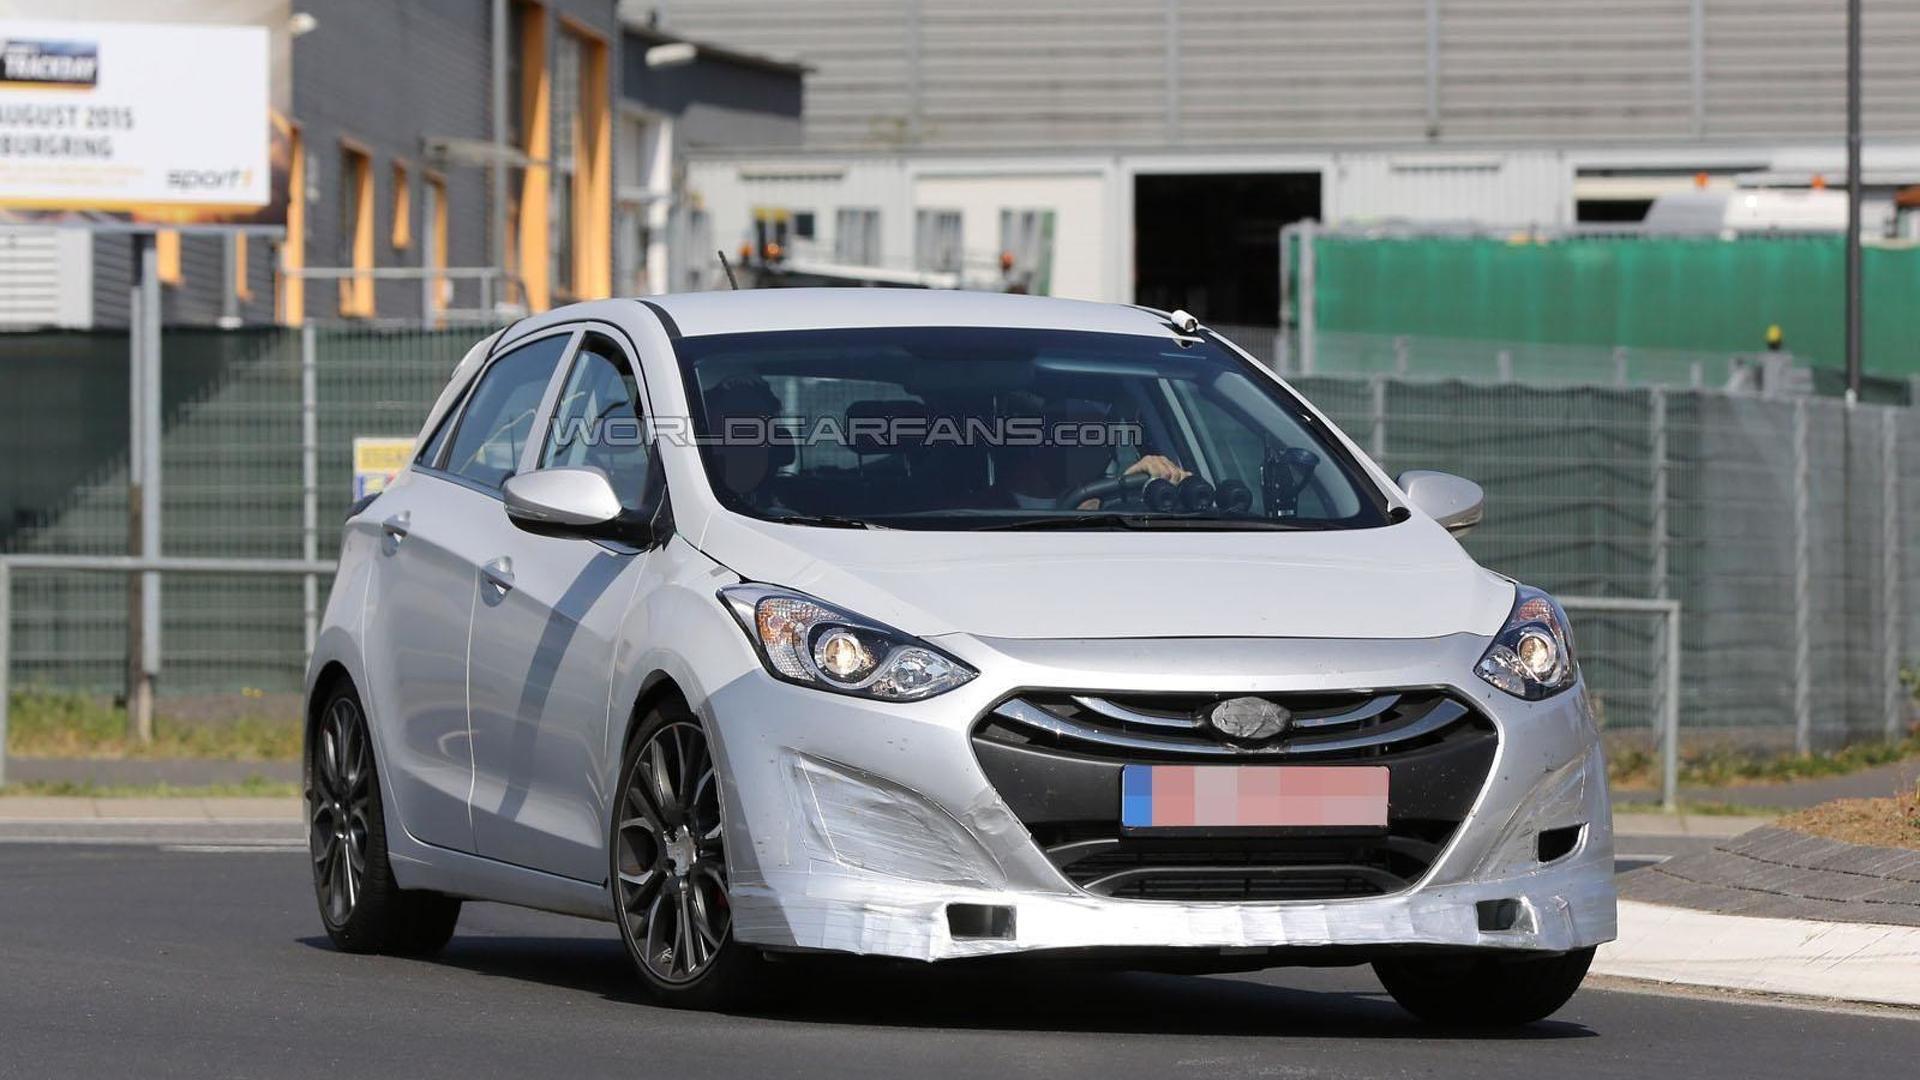 Hyundai i30 N reportedly heading to Frankfurt with 300 PS AWD setup